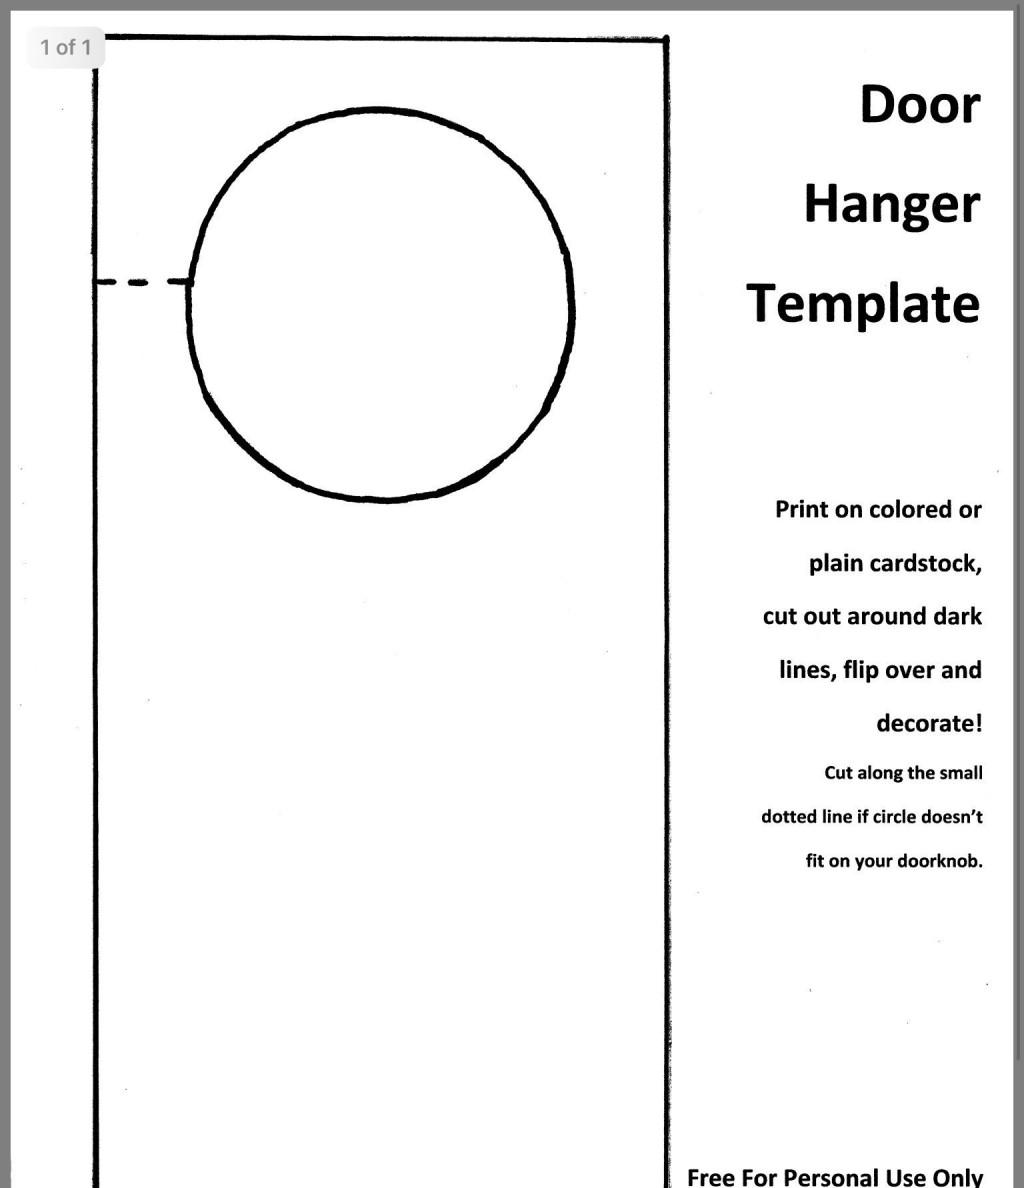 001 Unbelievable Free Printable Template For Door Hanger Highest Clarity Large